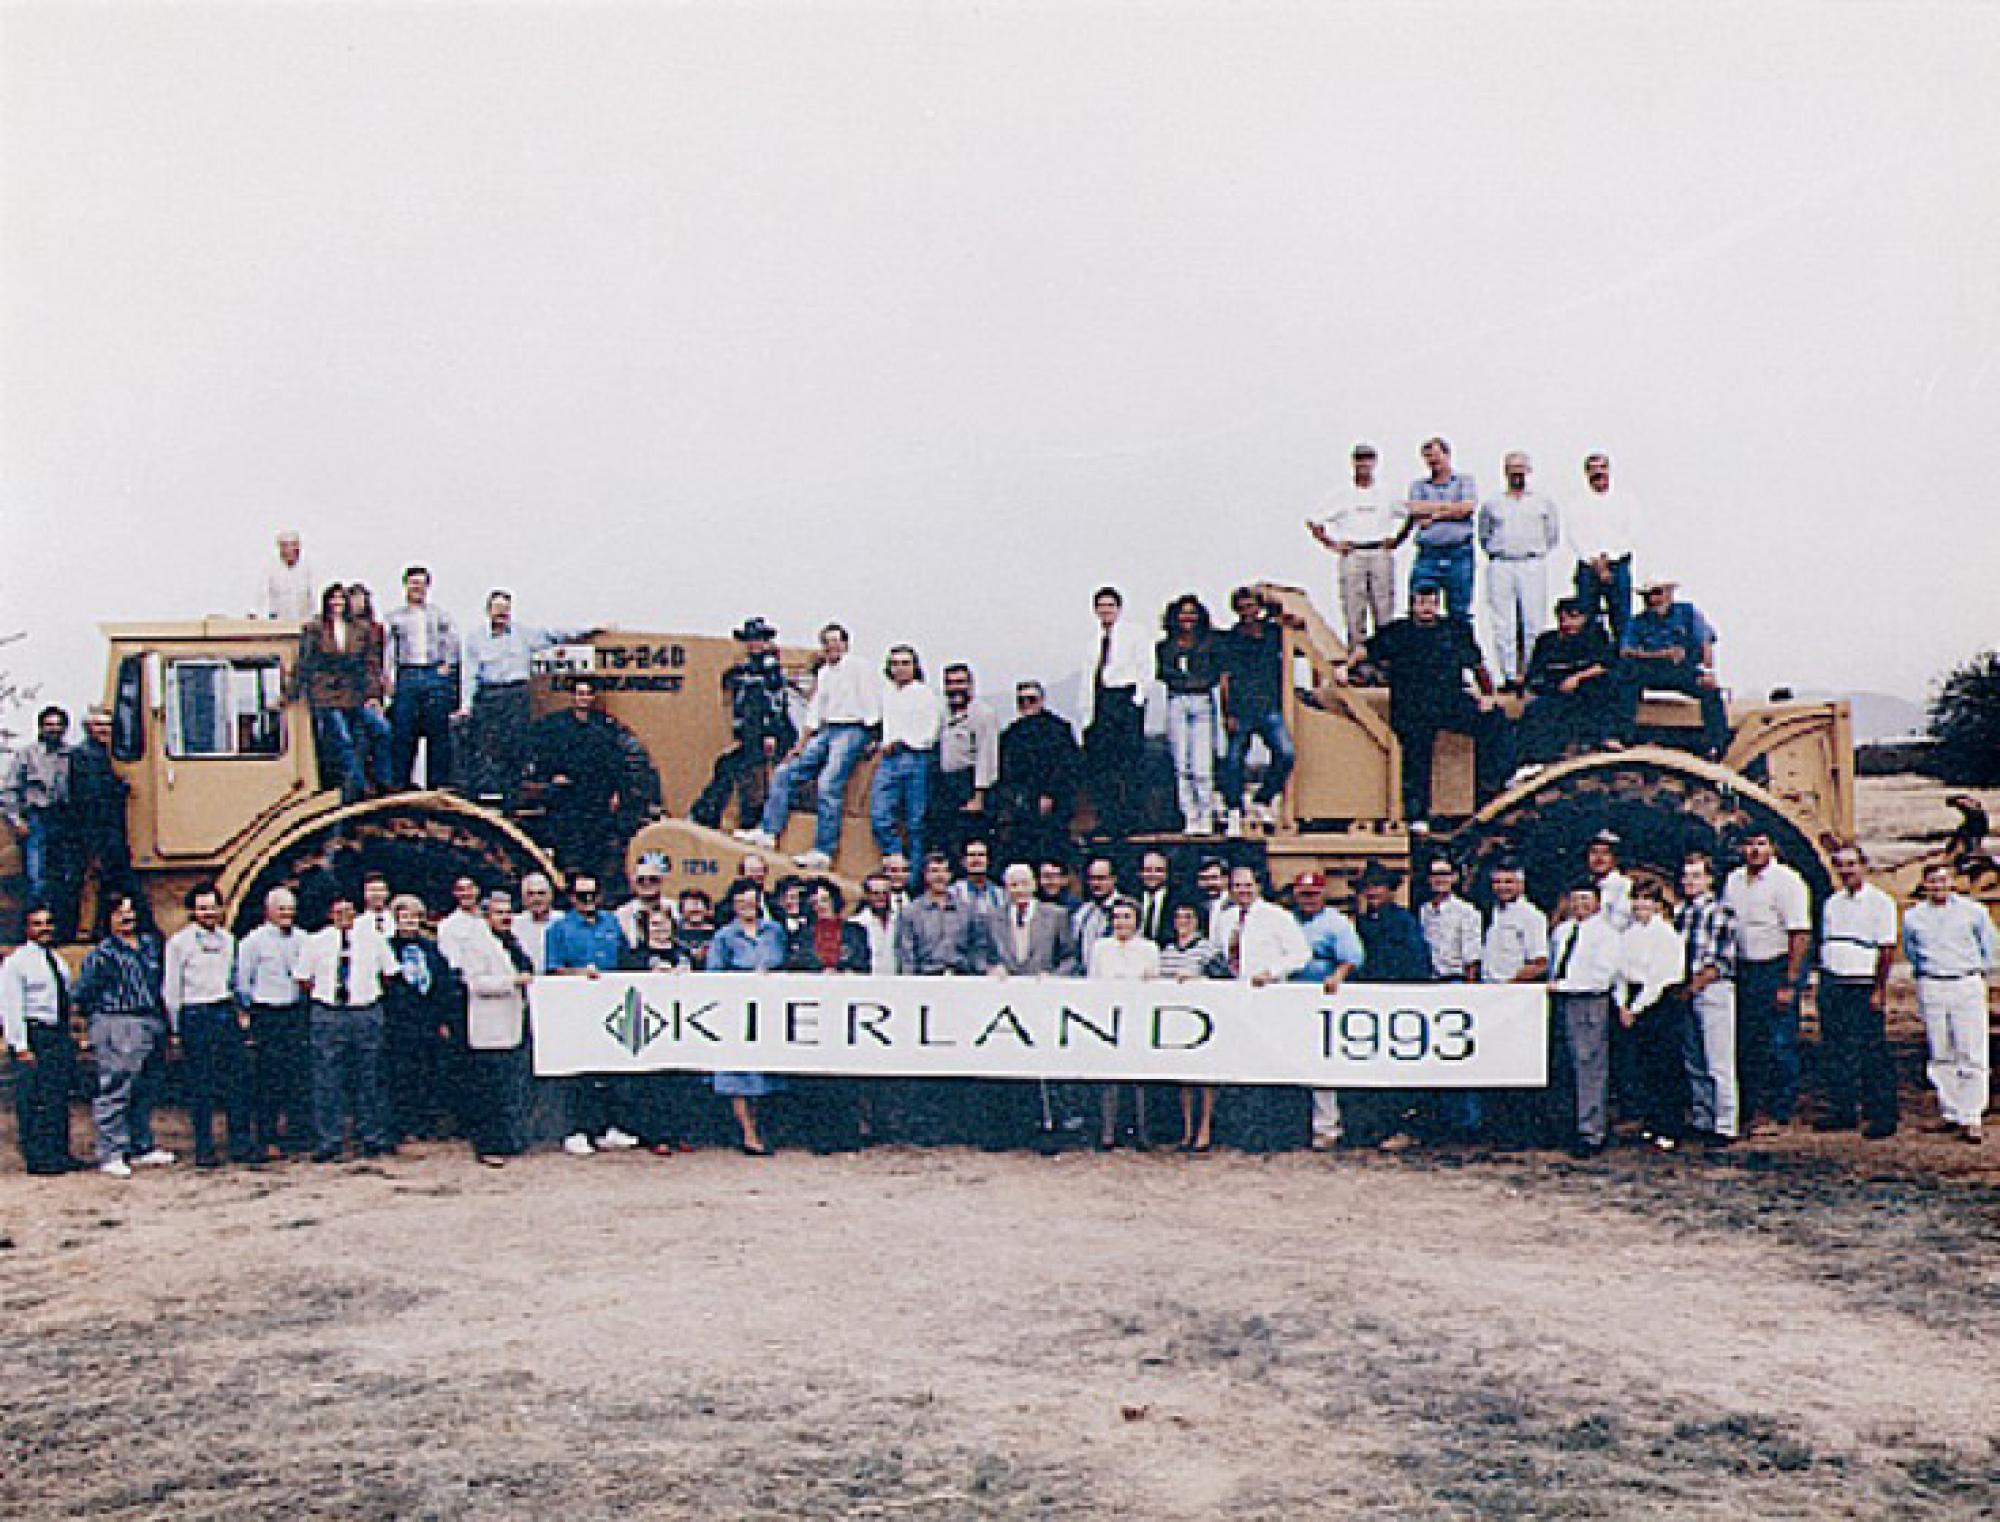 Kierland Groundbreaking, 1993